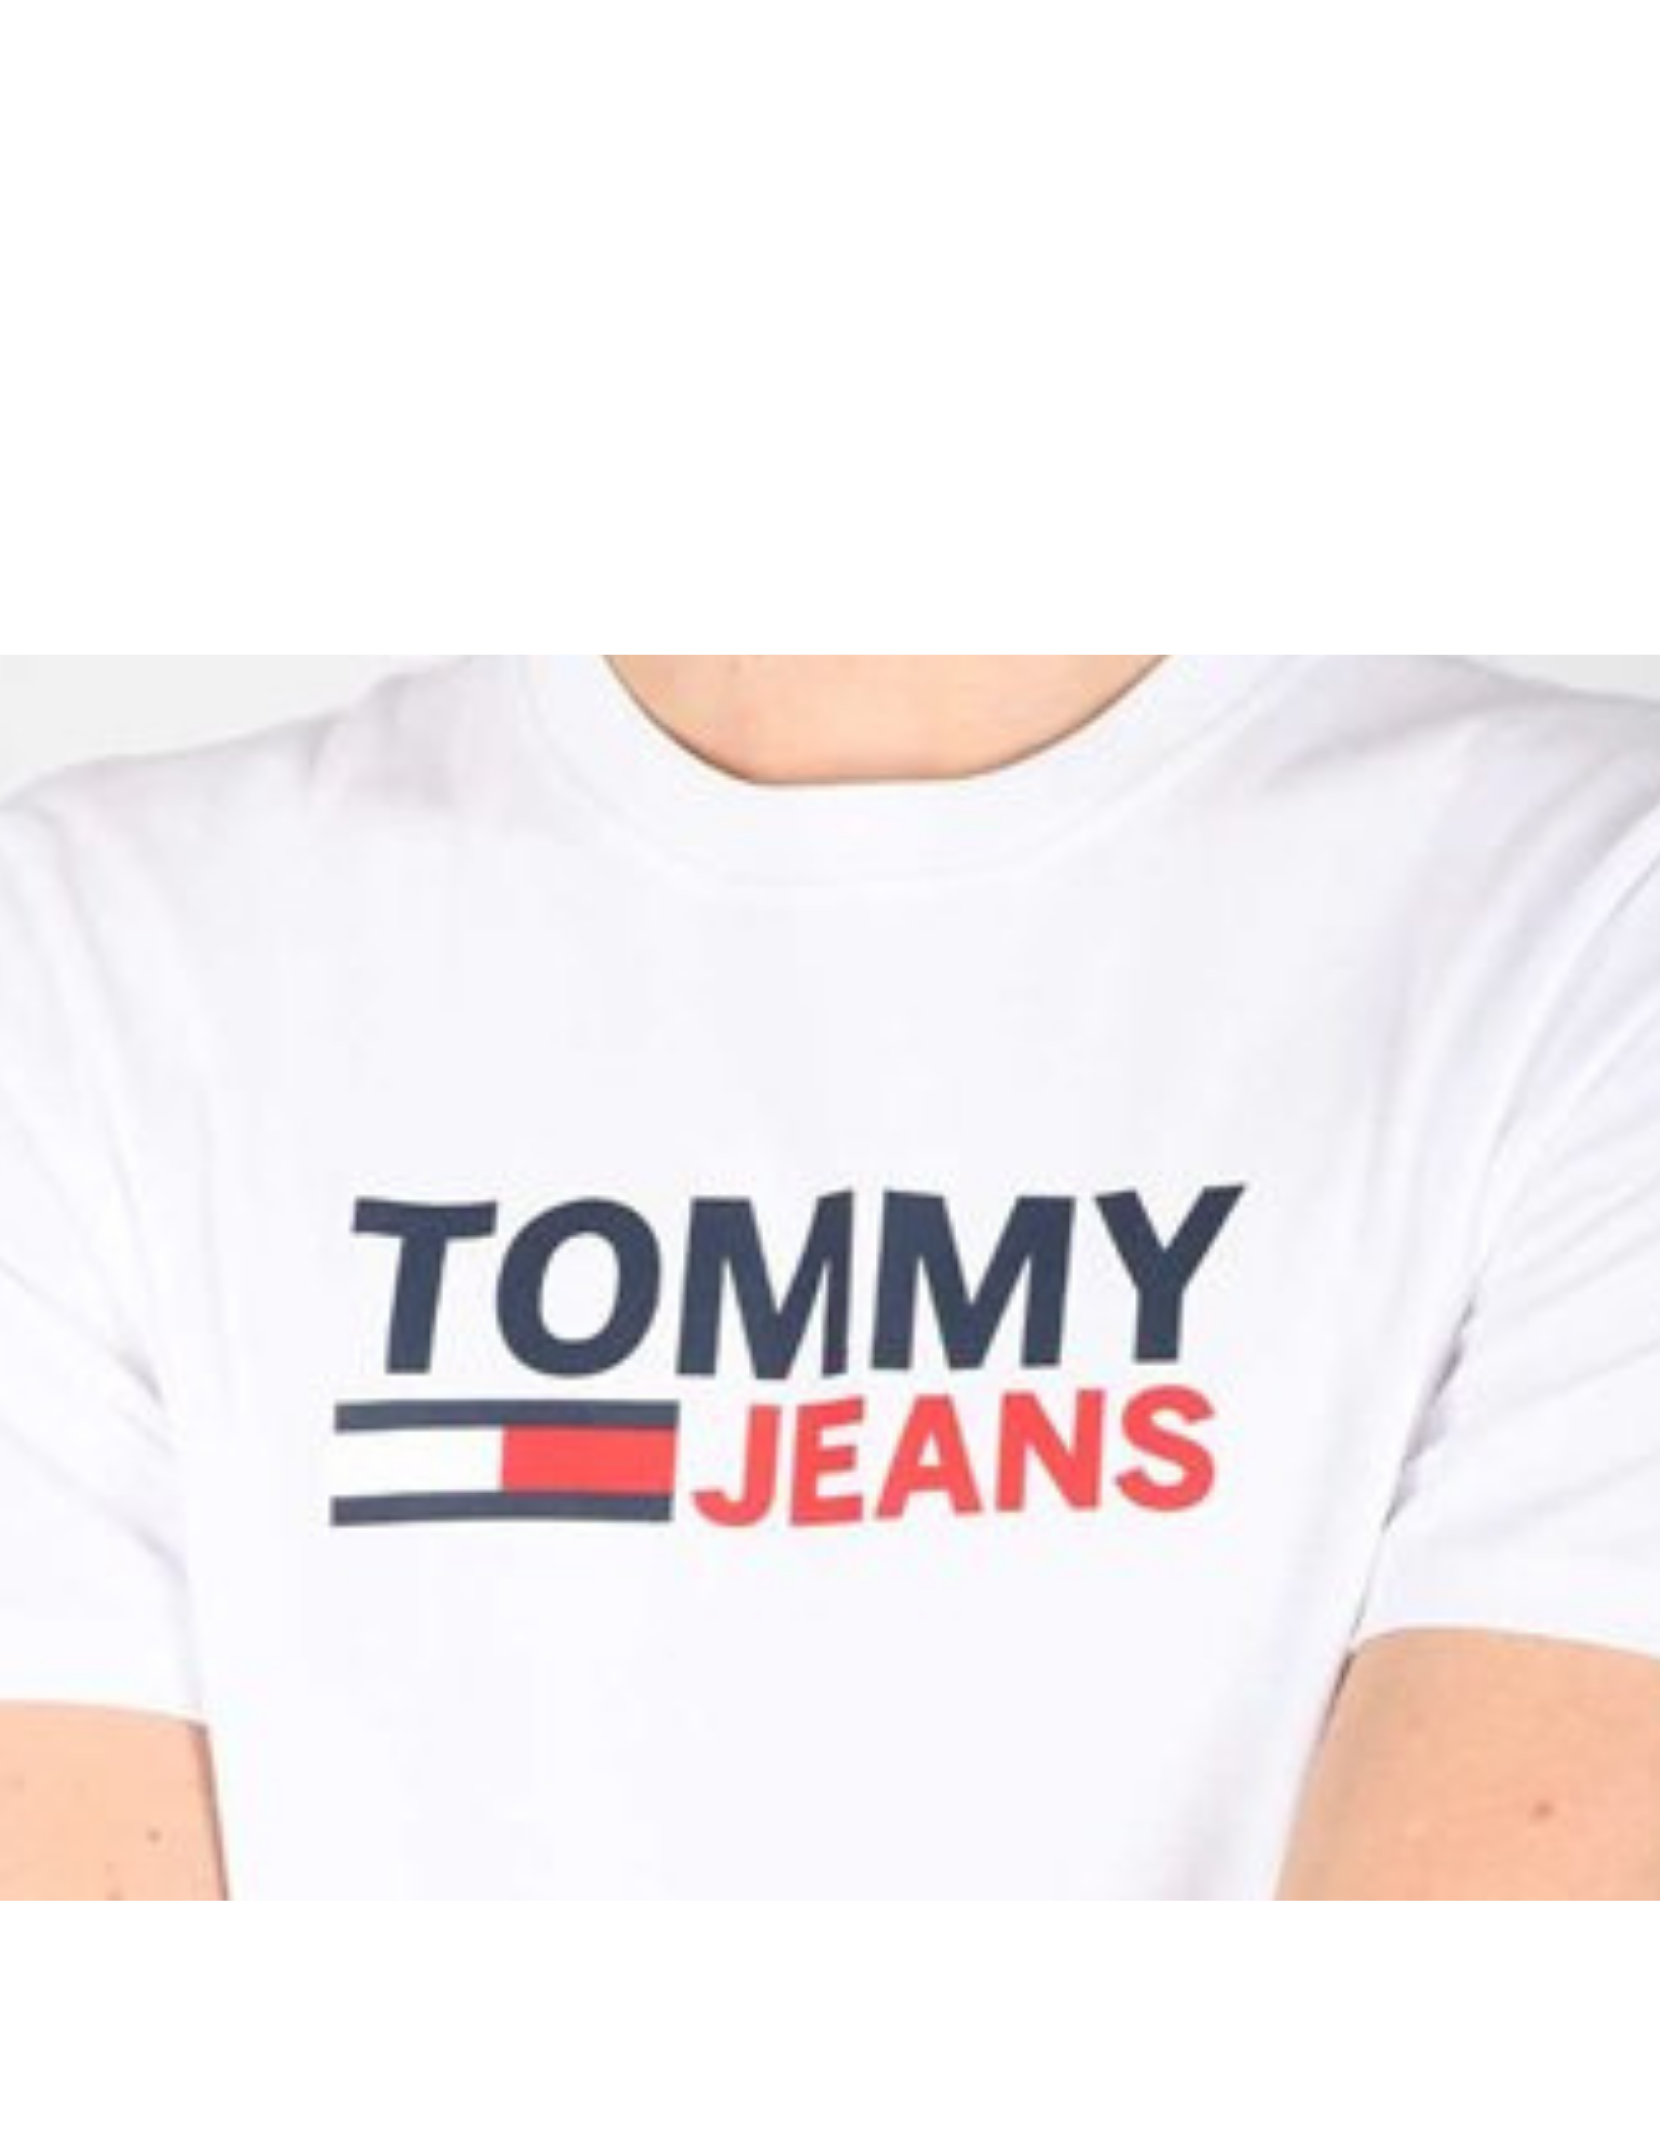 TOMMY JEANS T-SHIRT COPR LOGO UOMO TOMMY HILFIGER | T-SHIRT | DM10103YBR